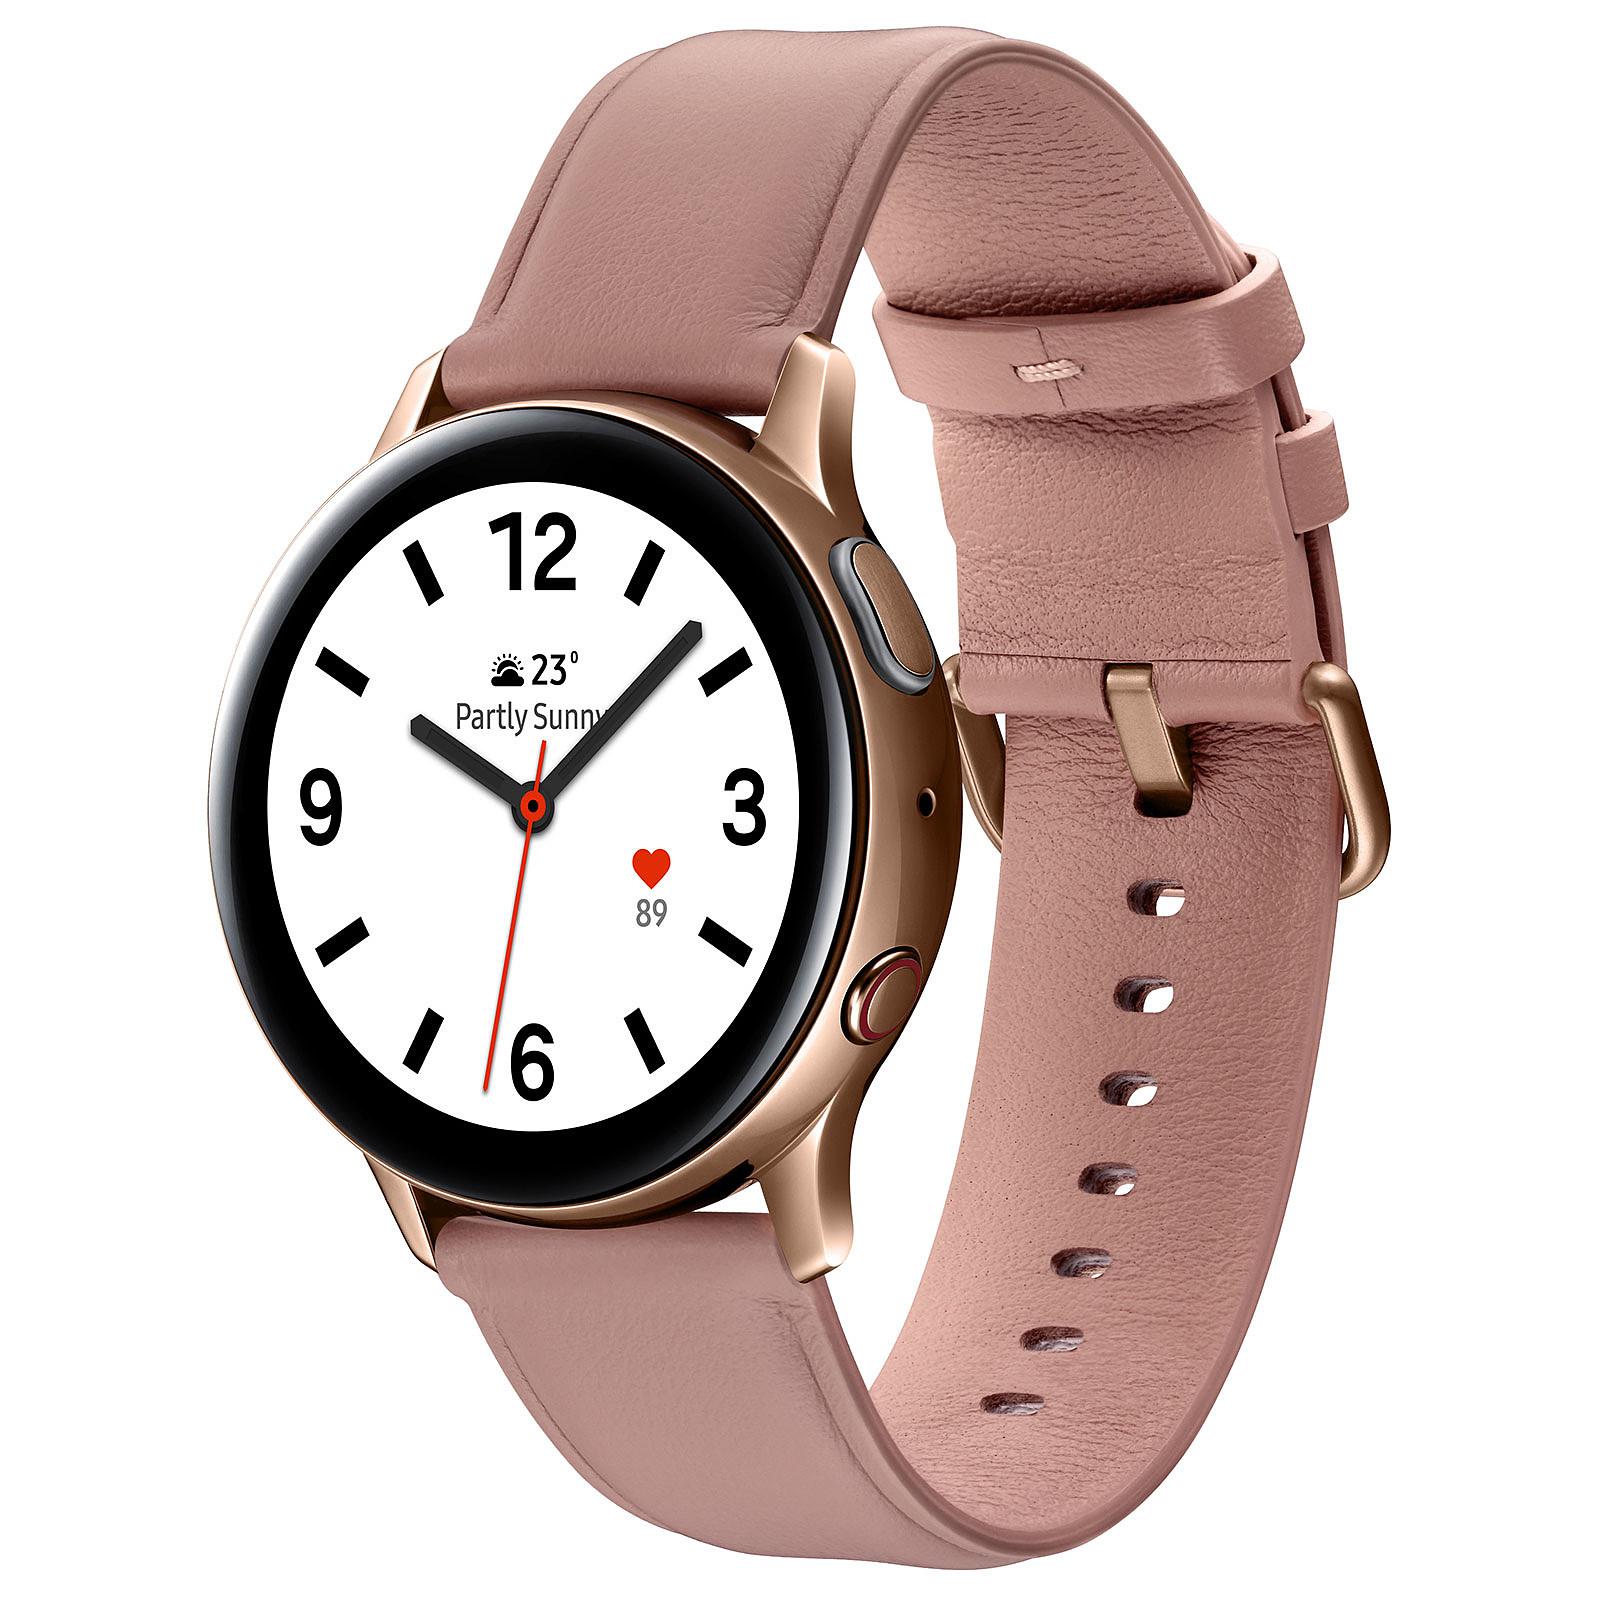 Samsung Galaxy Watch Active 2 4G (40 mm / Acier / Rose Lumière)